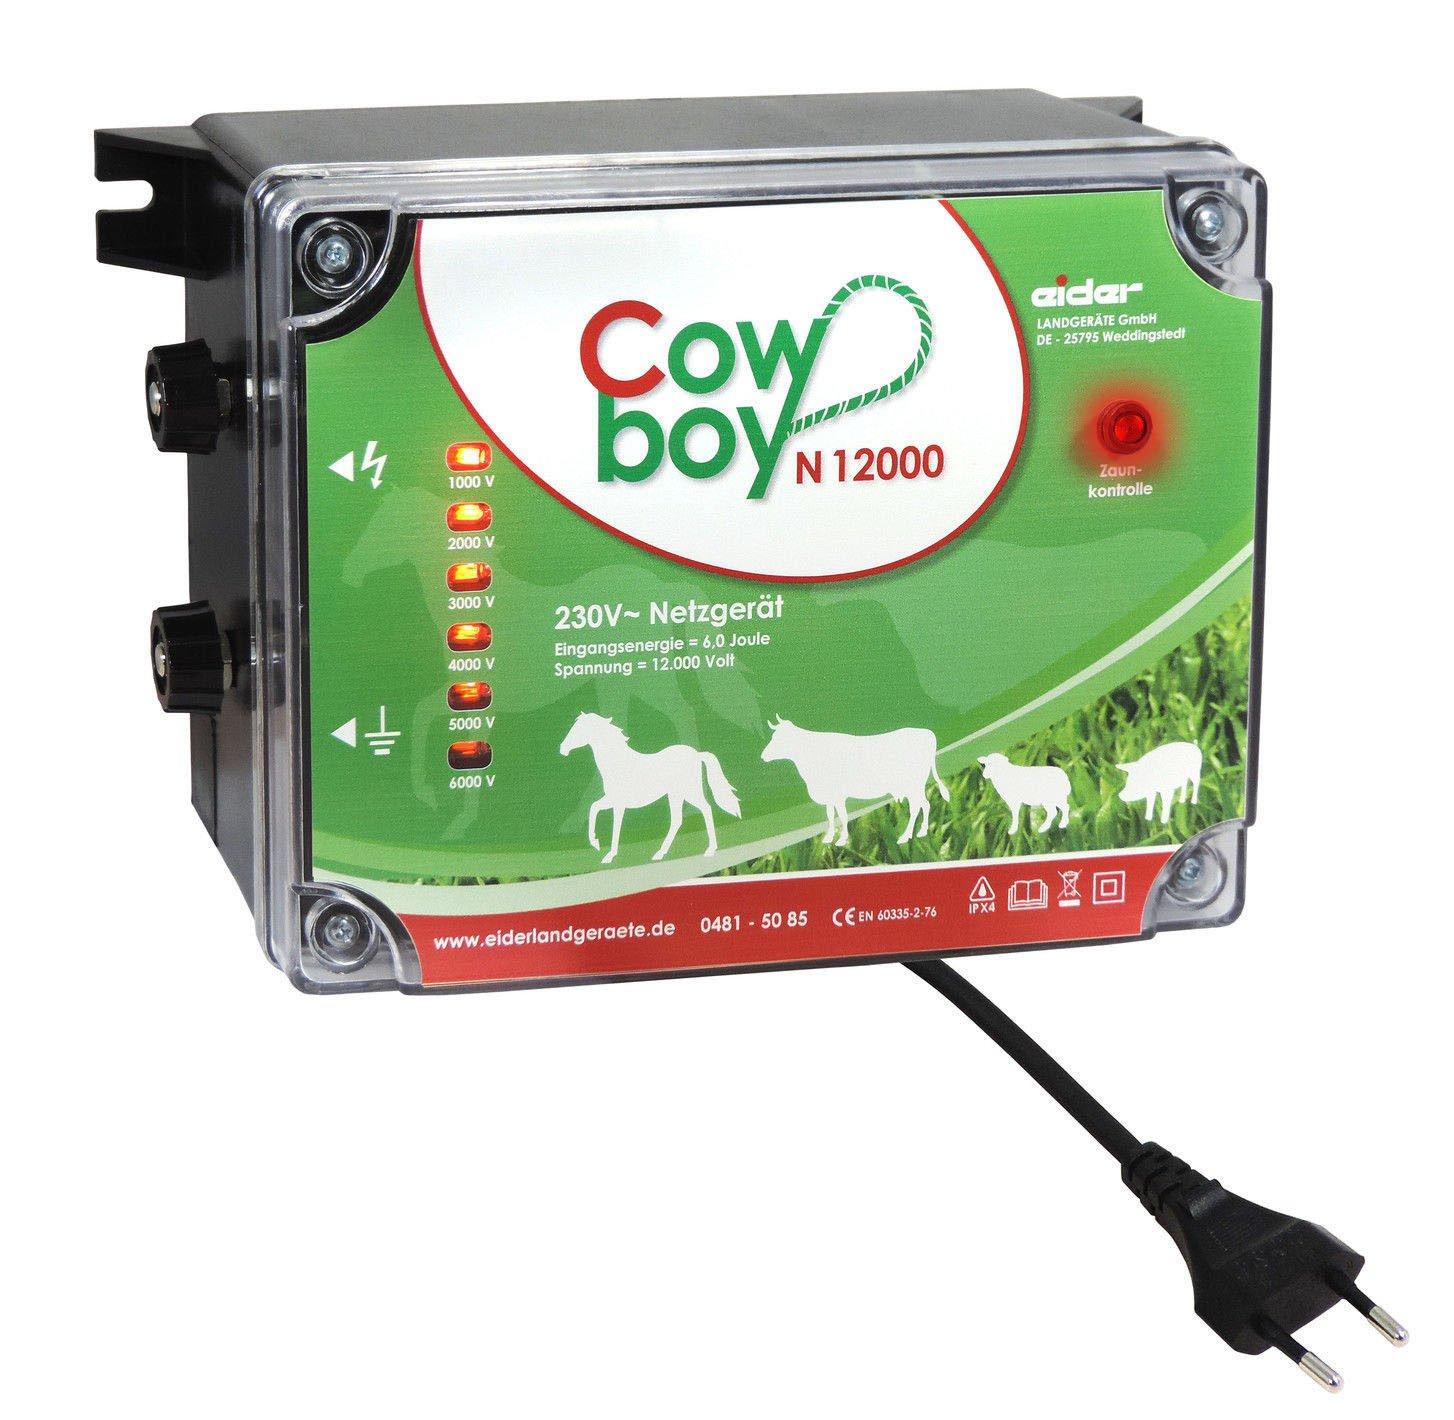 Weidezaungerät N12000 - 230V - Extra Power : 230V, 6 Joule, 12000 Volt